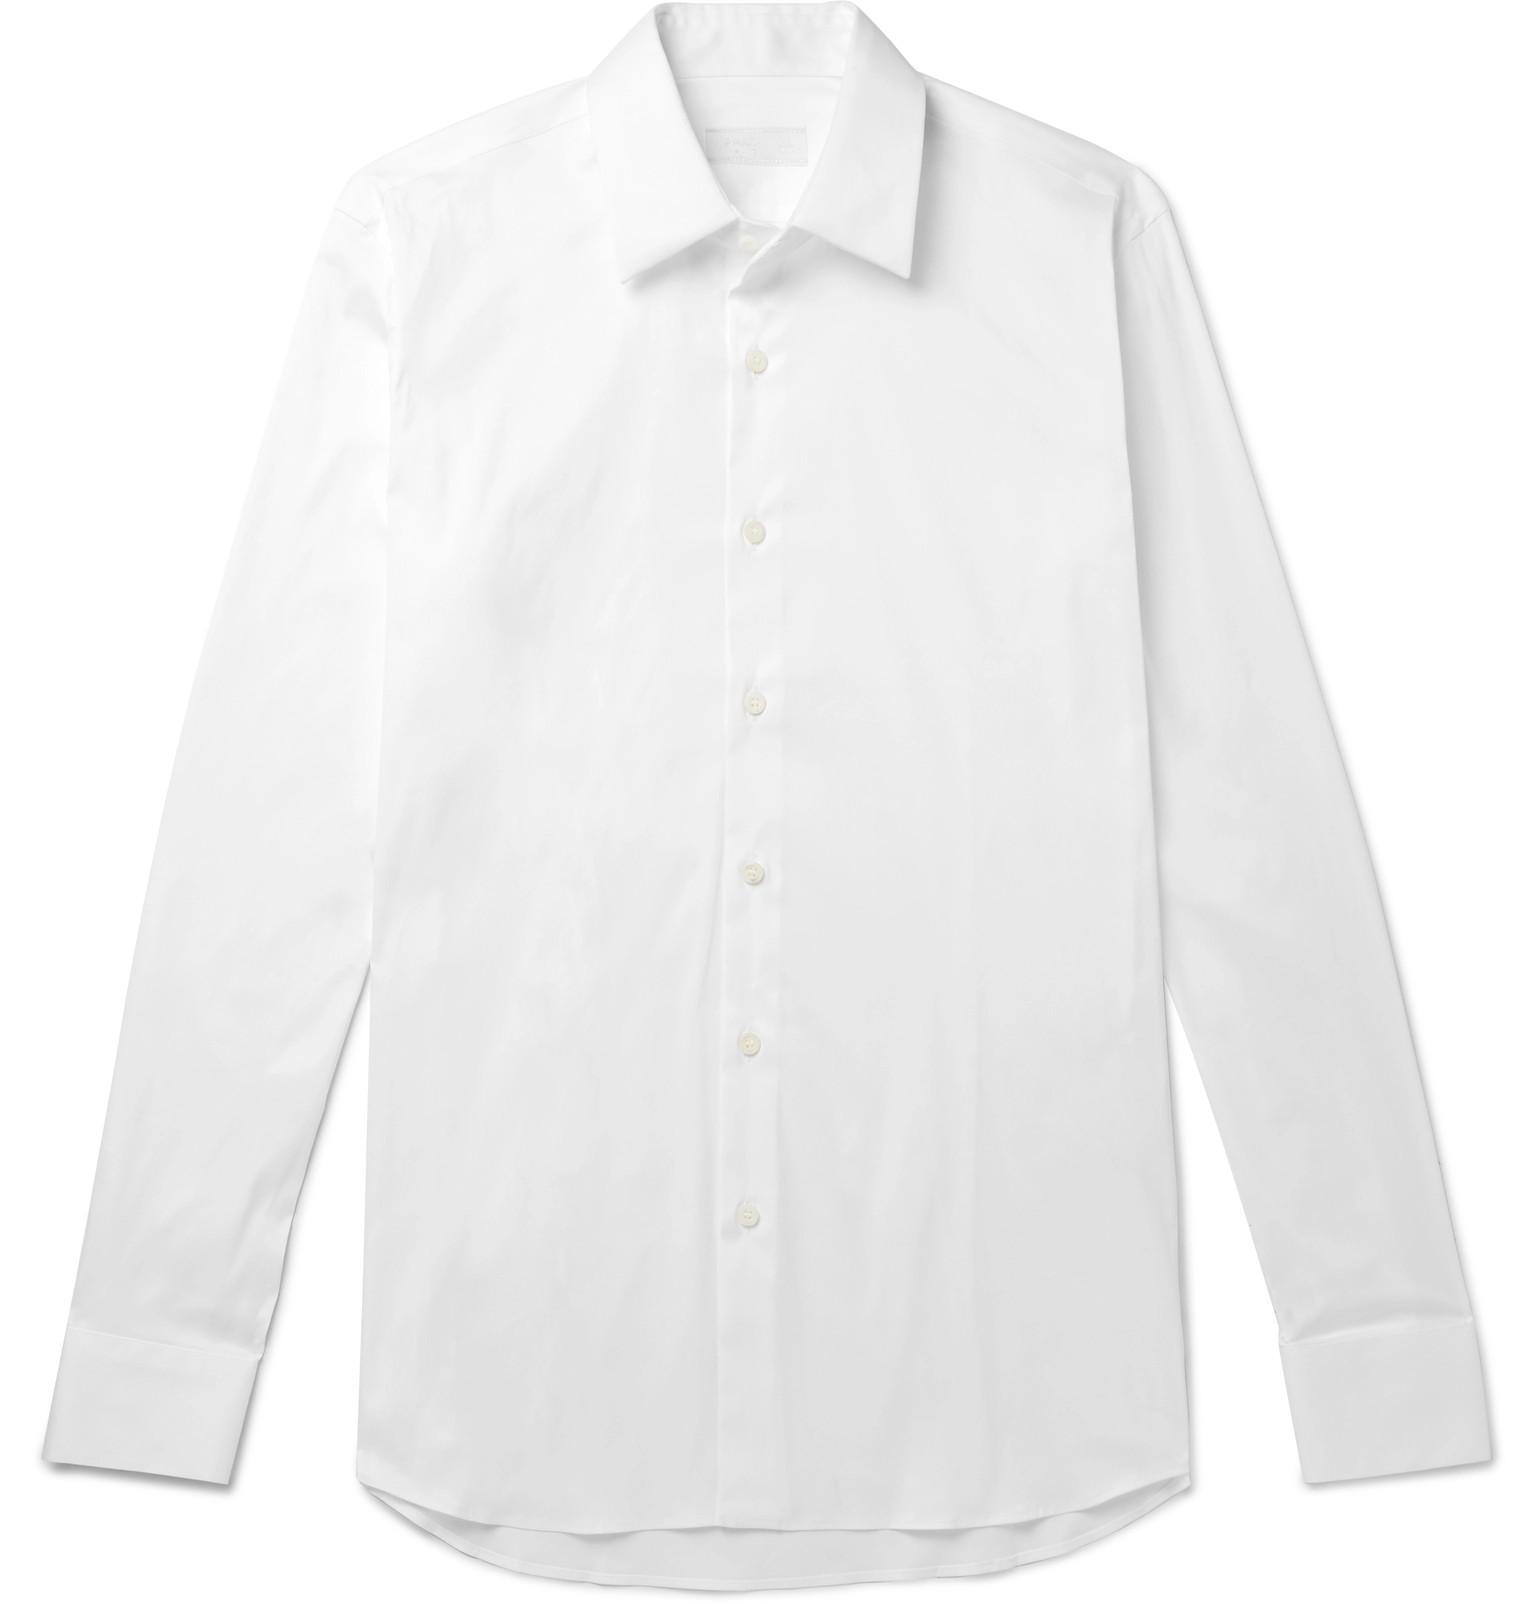 017790f5 Prada Slim-fit Cotton-blend Poplin Shirt in White for Men - Lyst